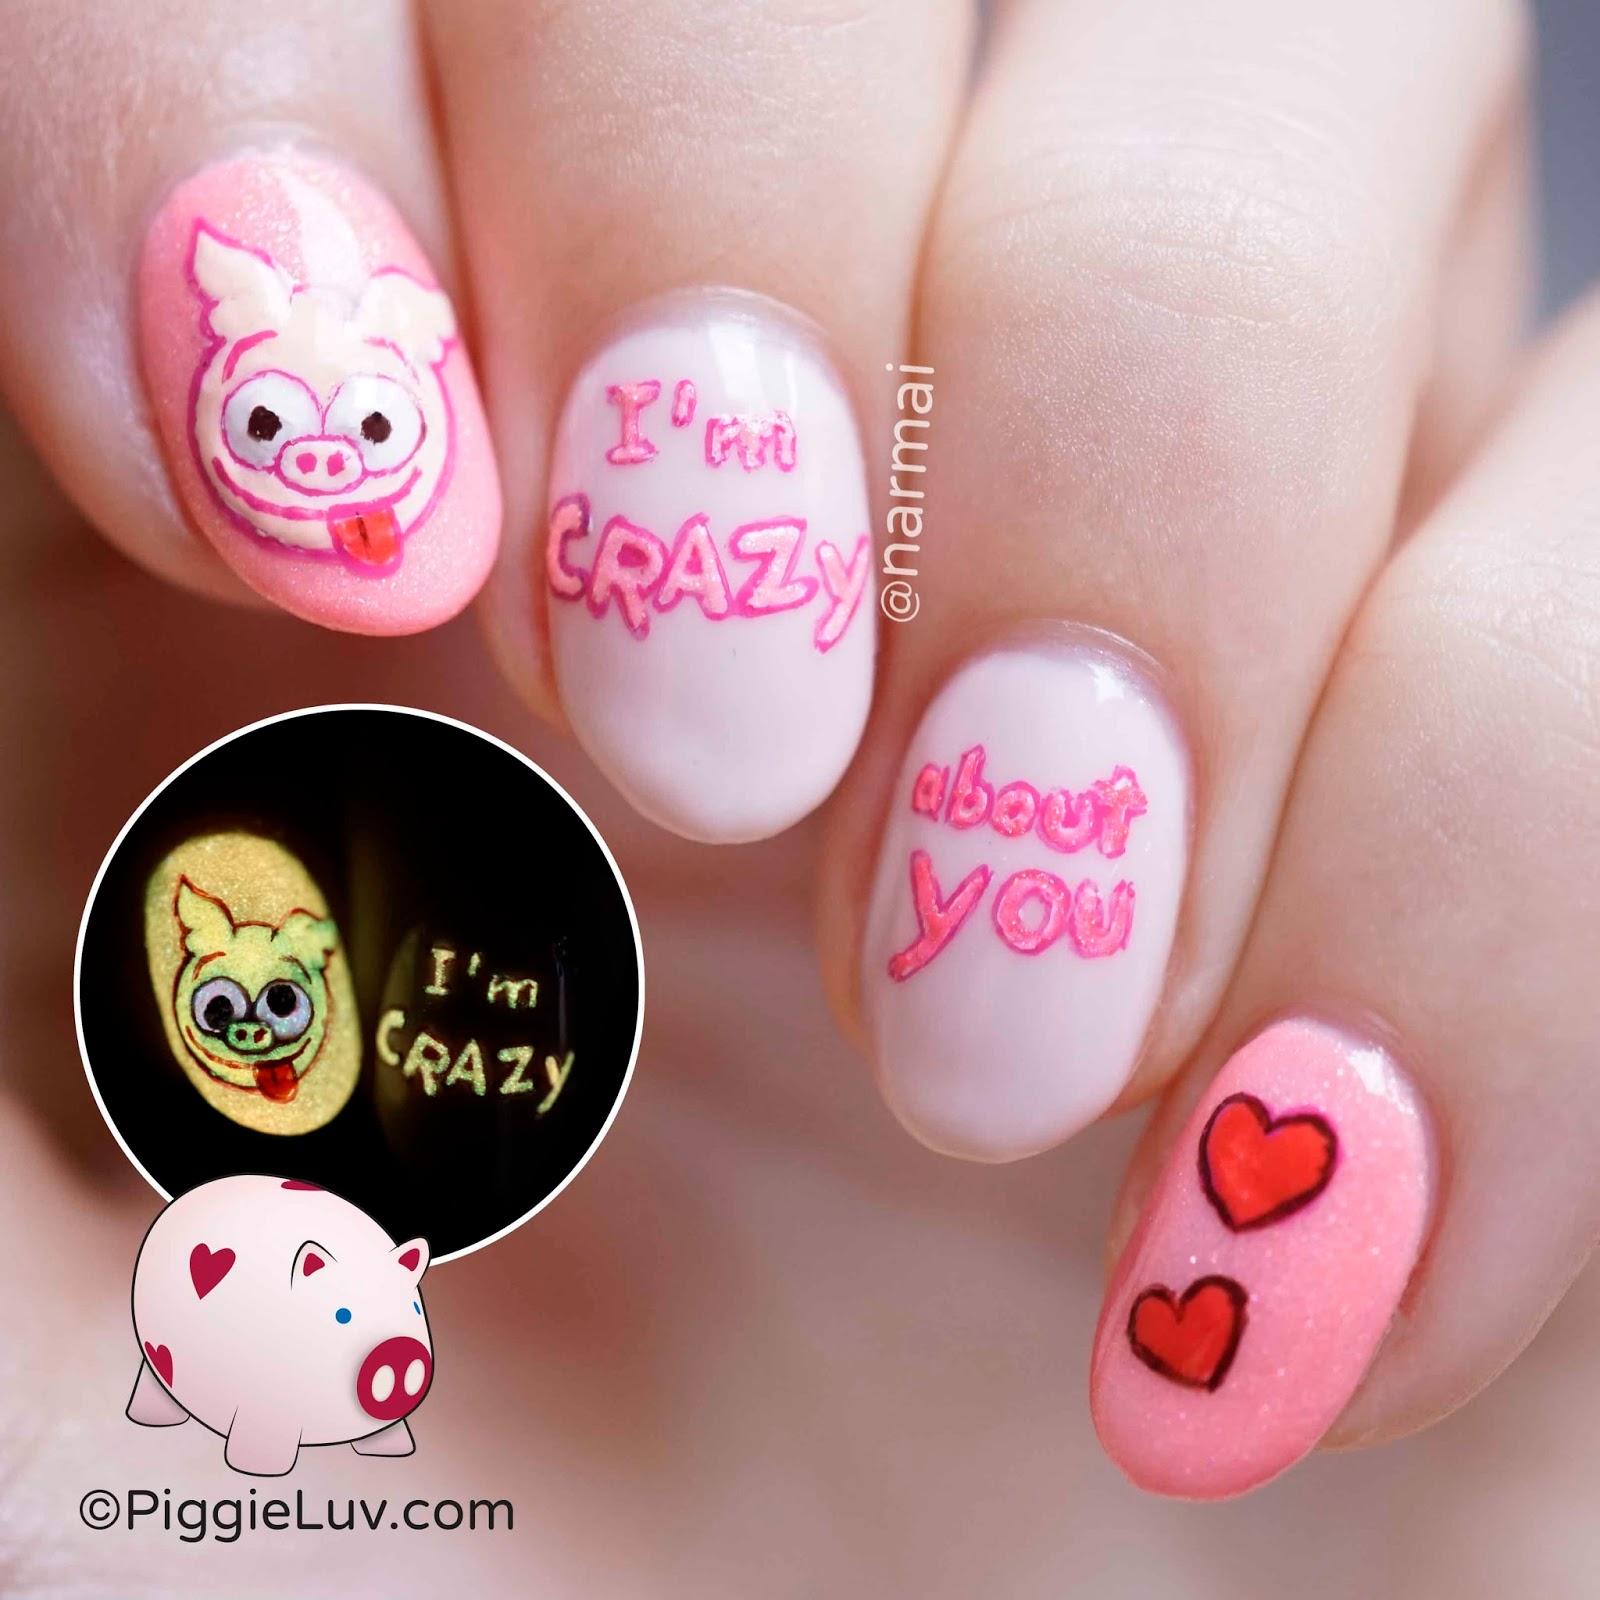 PiggieLuv: Crazy eyes pig nail art for Valentine's Day